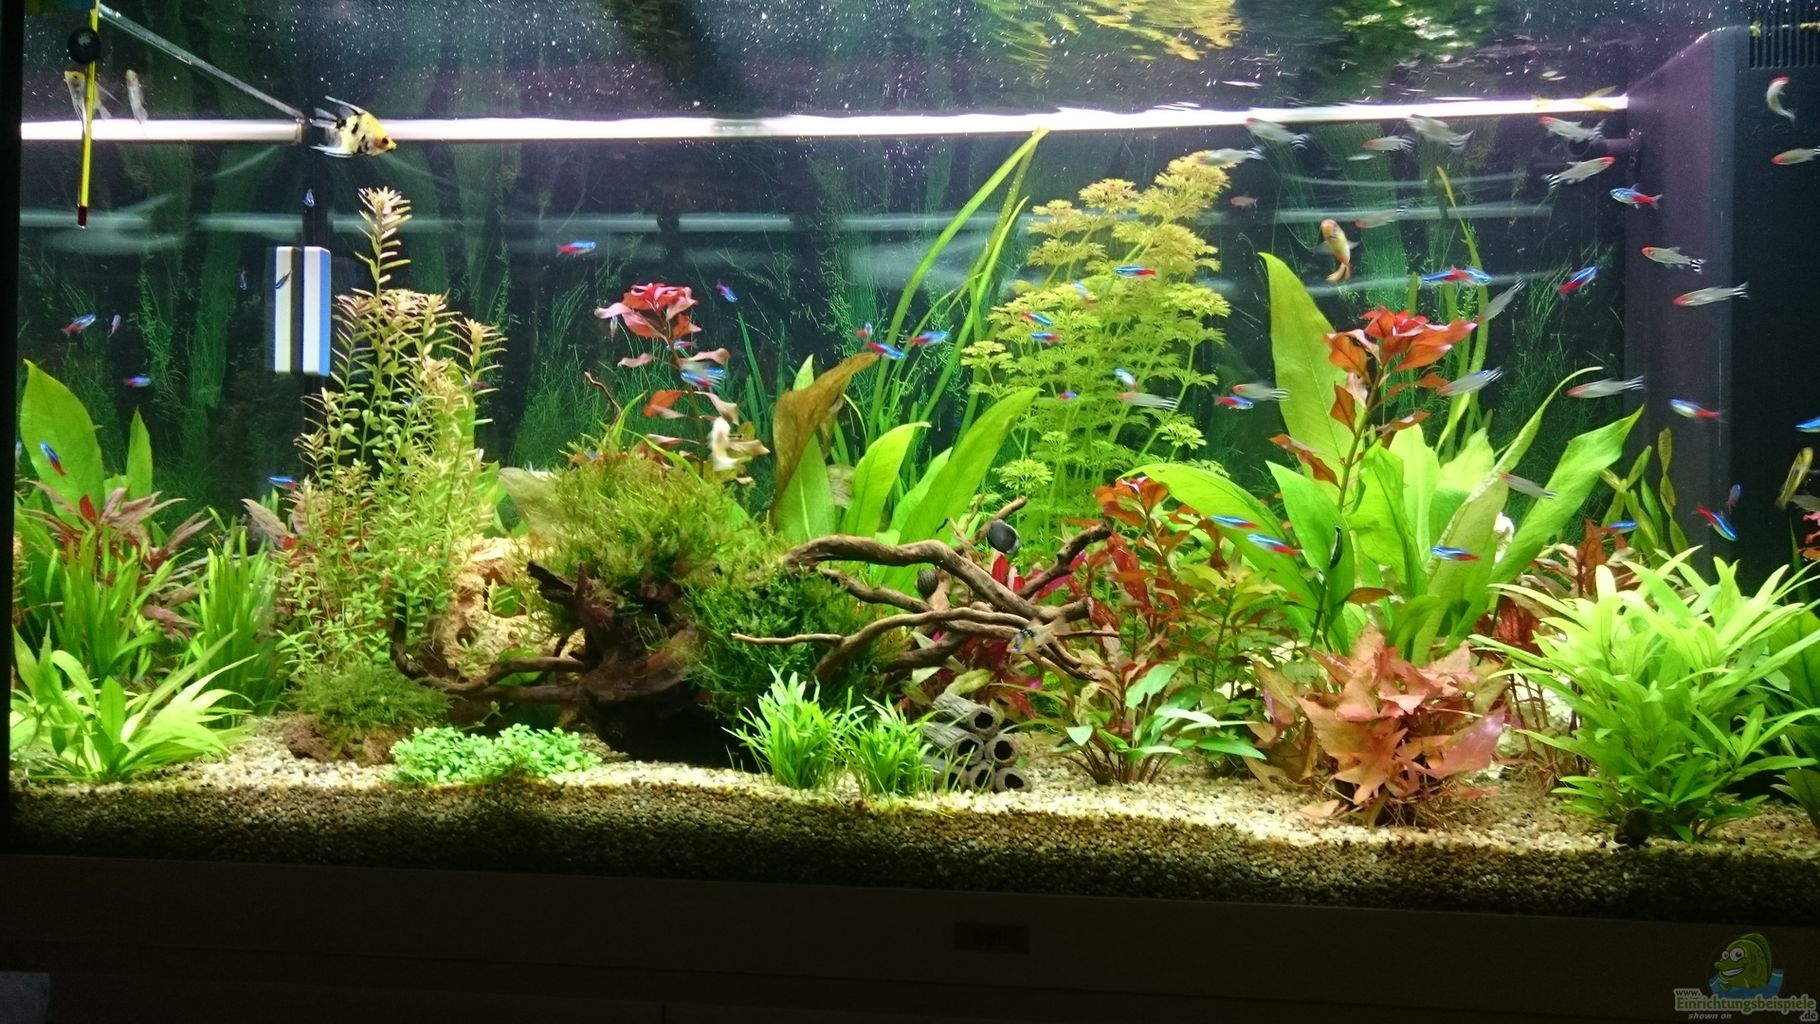 aquarium lampe f r pflanzen pflanzen lampe kaufen bei obi. Black Bedroom Furniture Sets. Home Design Ideas